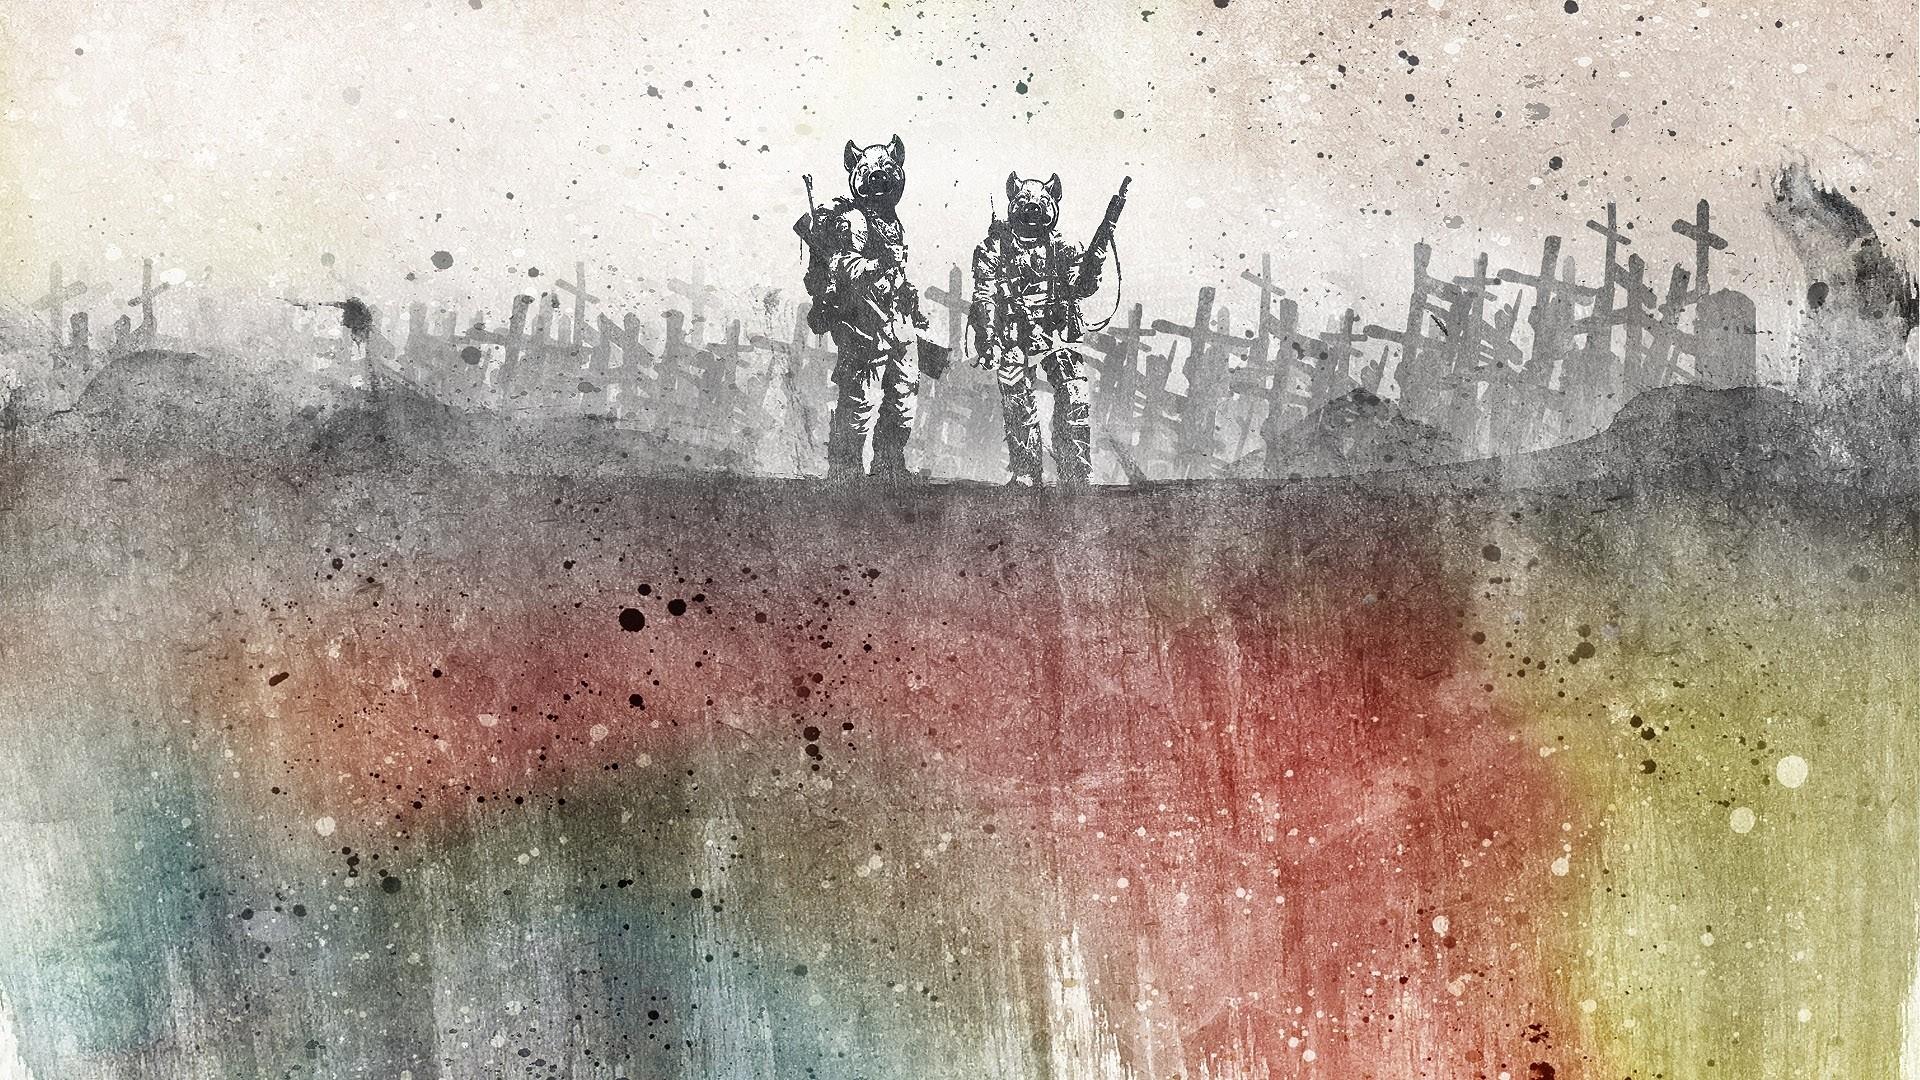 Wallpaper Gambar Lukisan Seni Digital Seni Fantasi